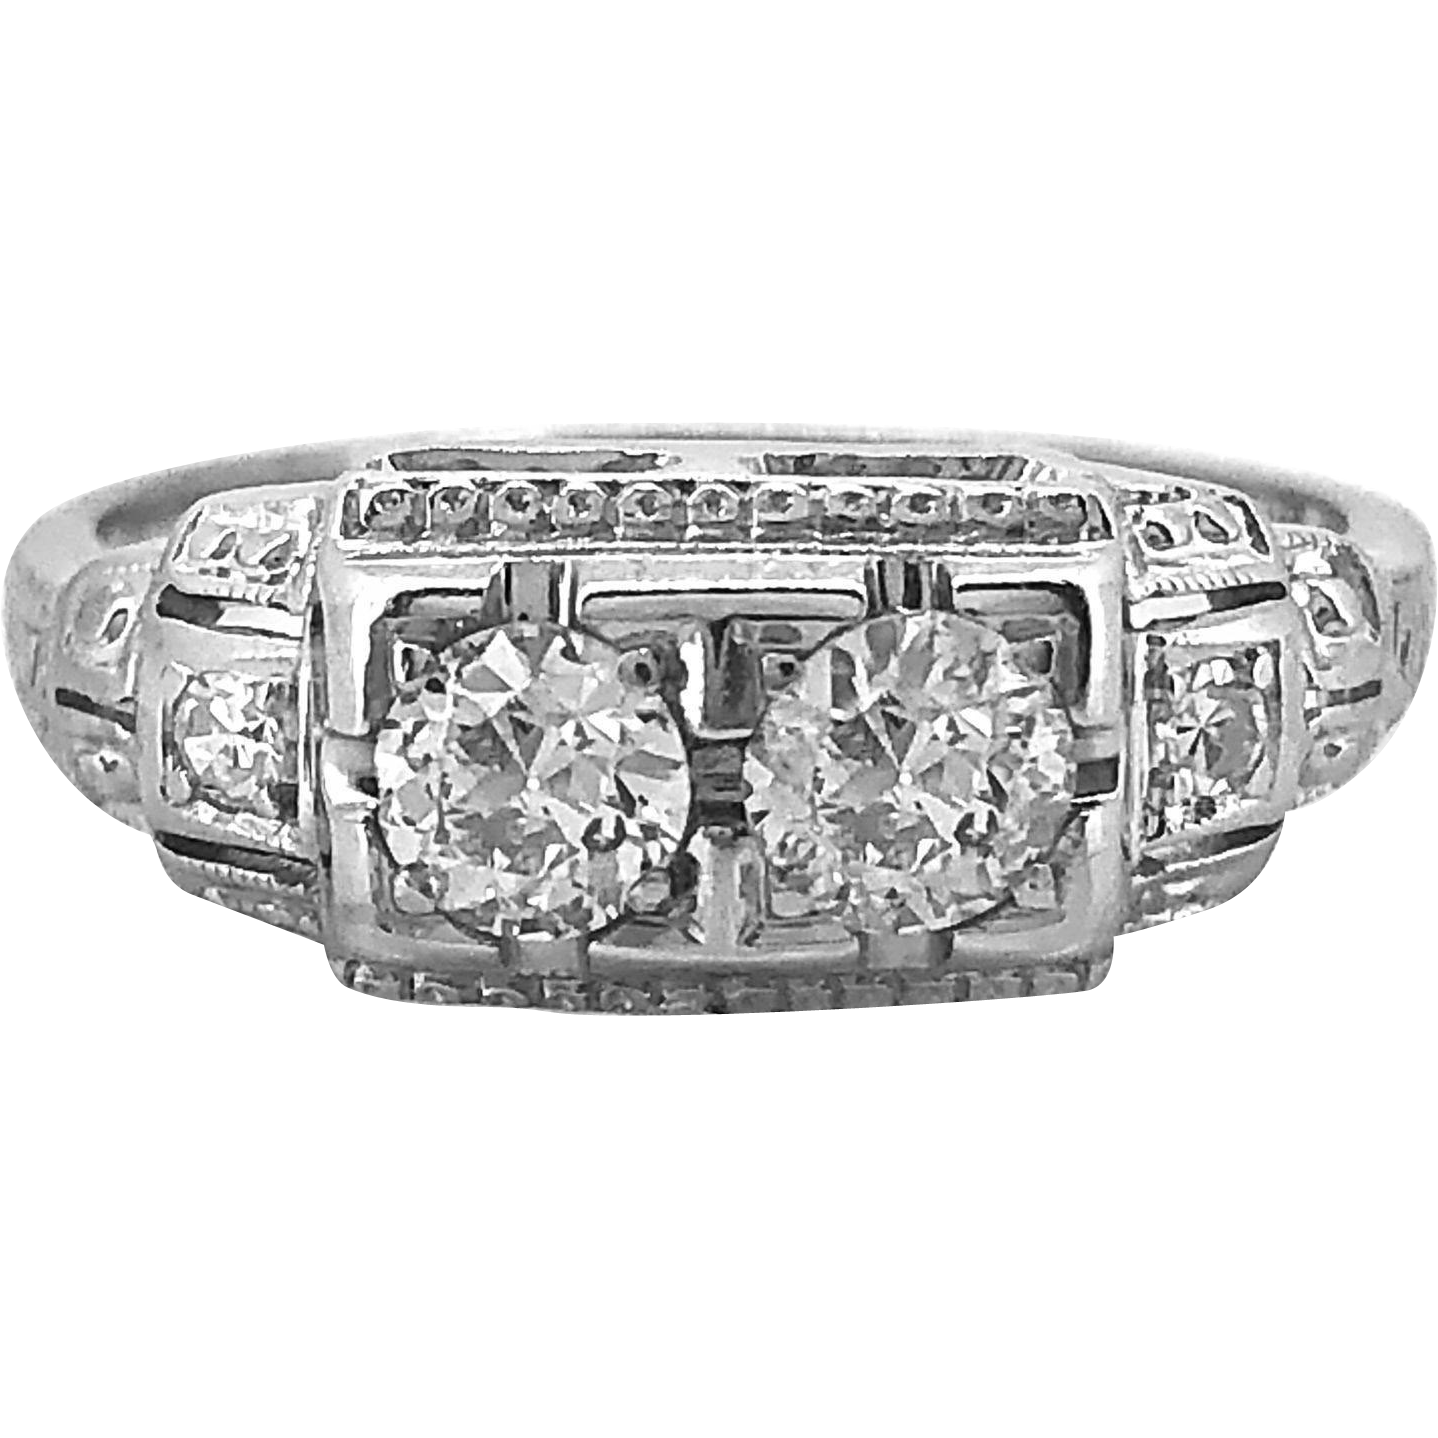 Jabel .55ct. T.W. Art Deco Diamond Antique Engagement - Fashion Ring 18k White Gold